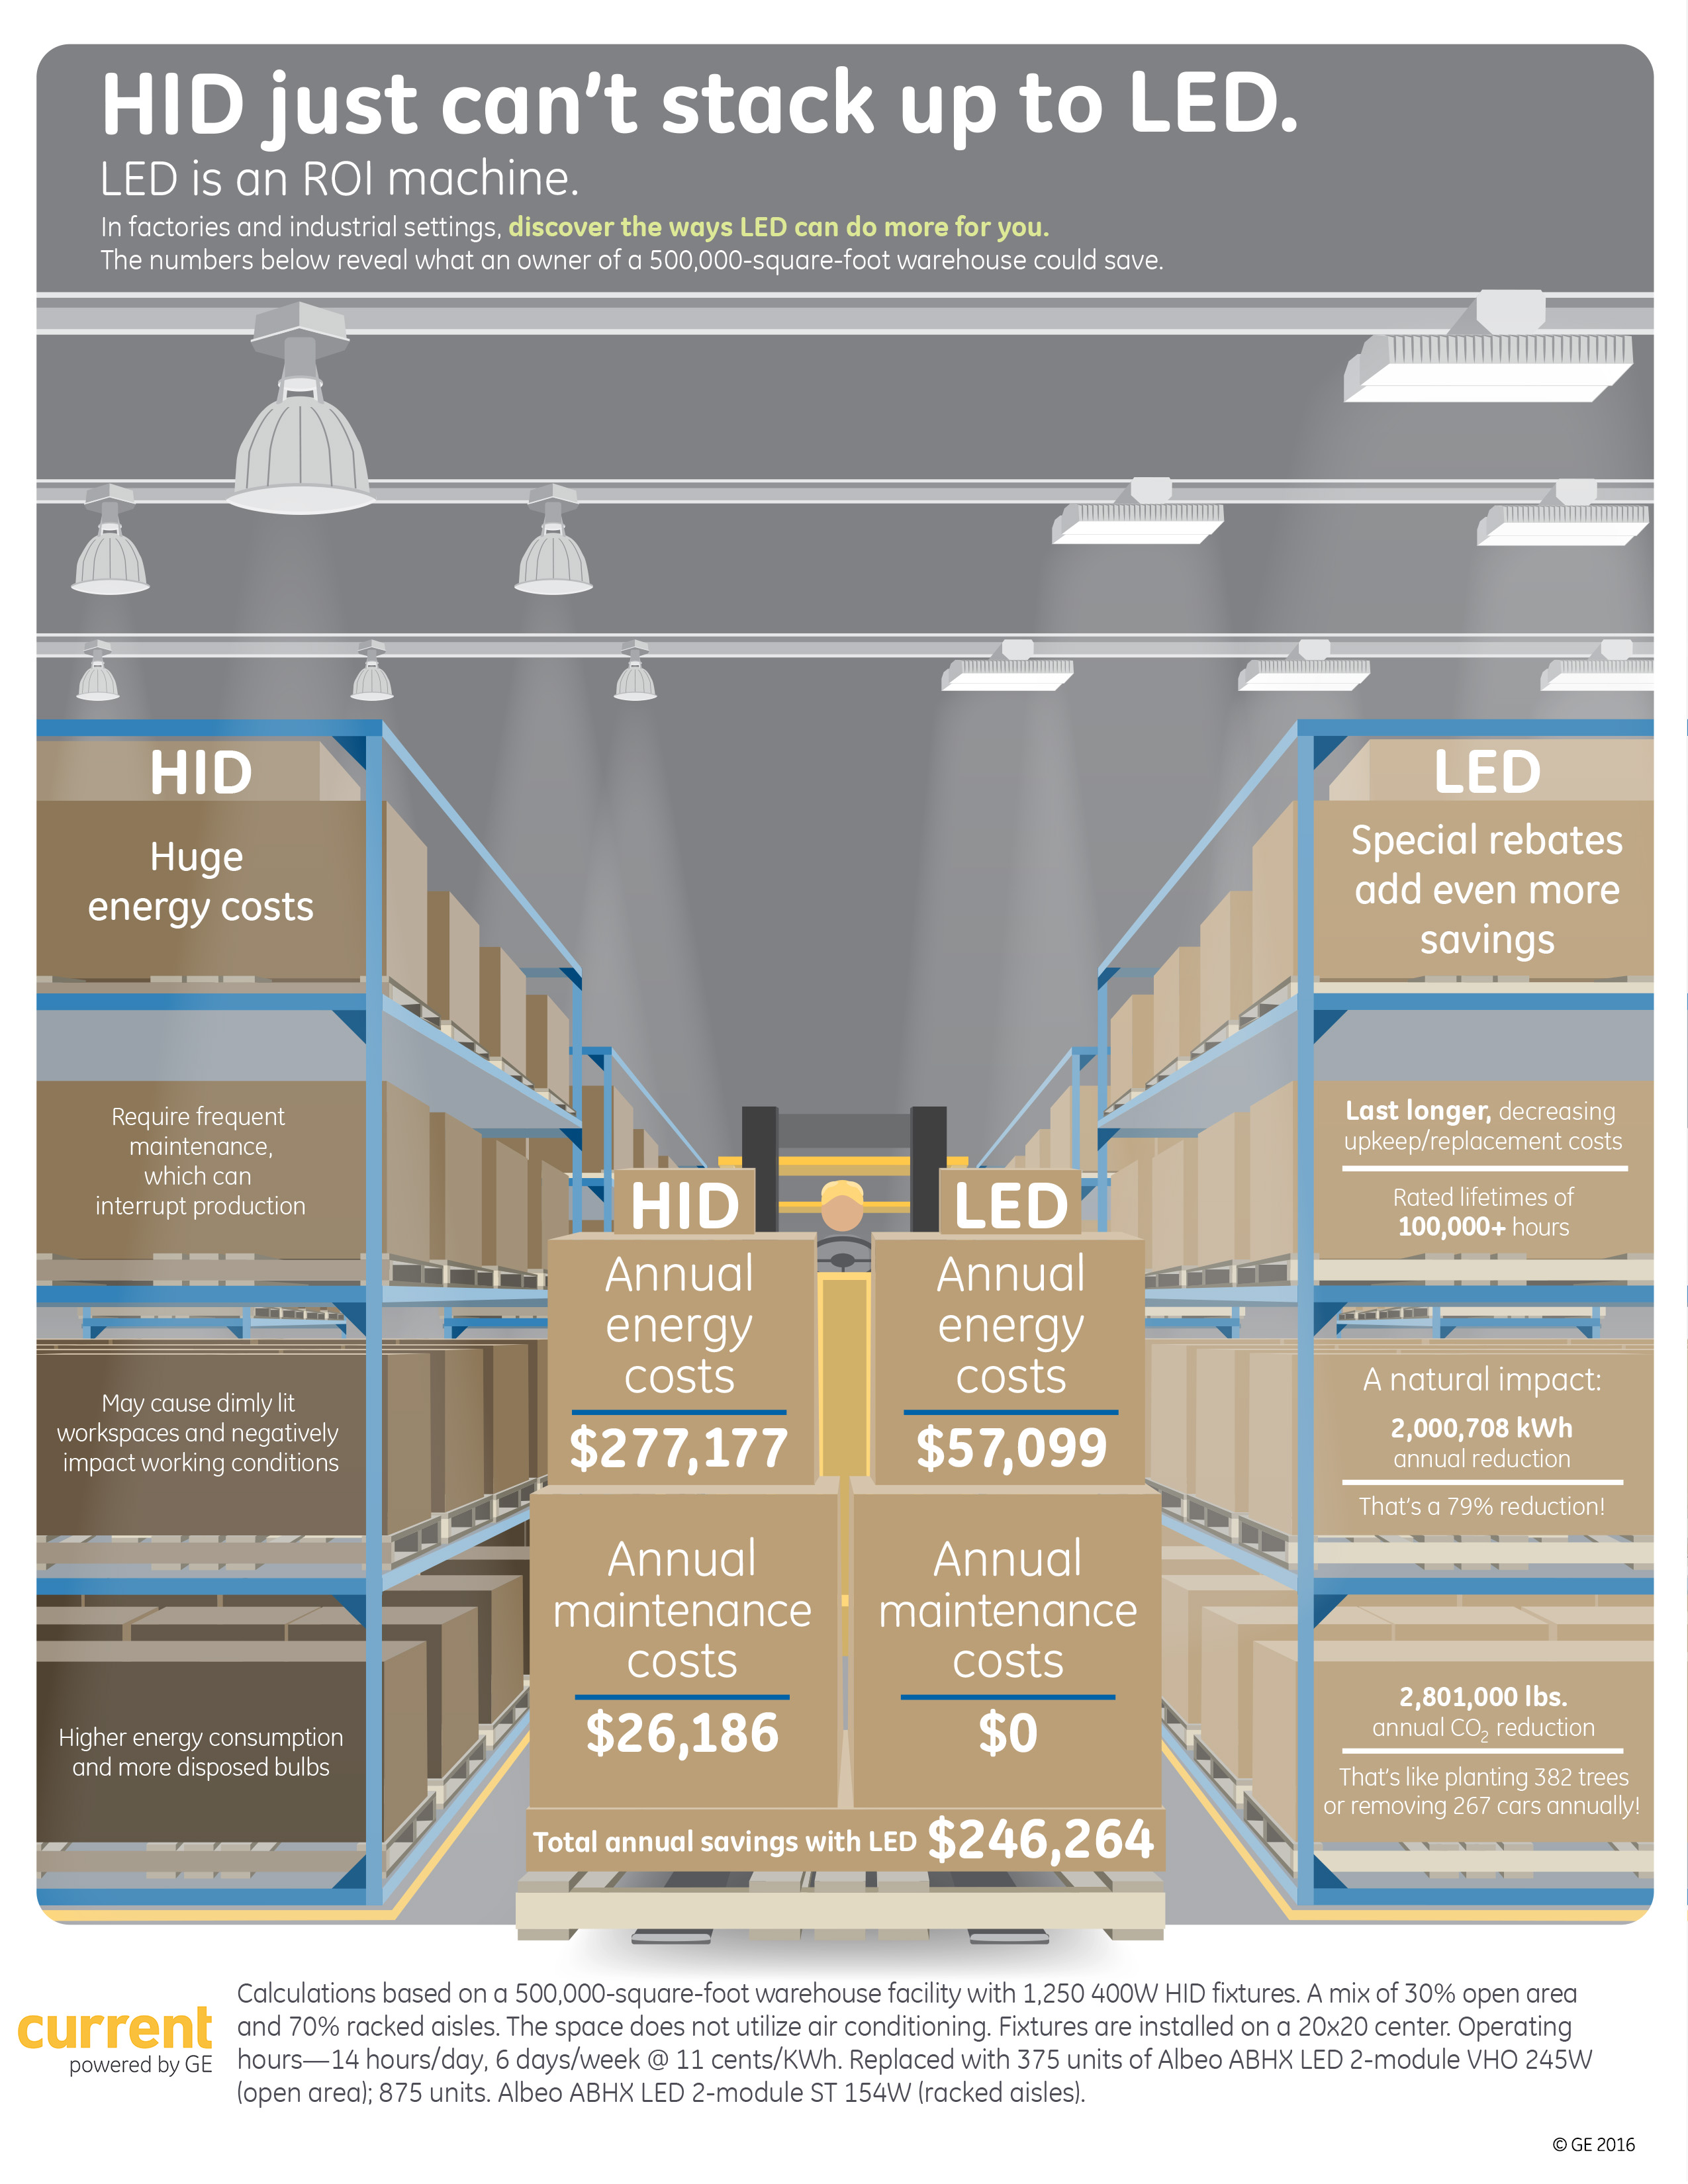 LED vs HID lighting infographic